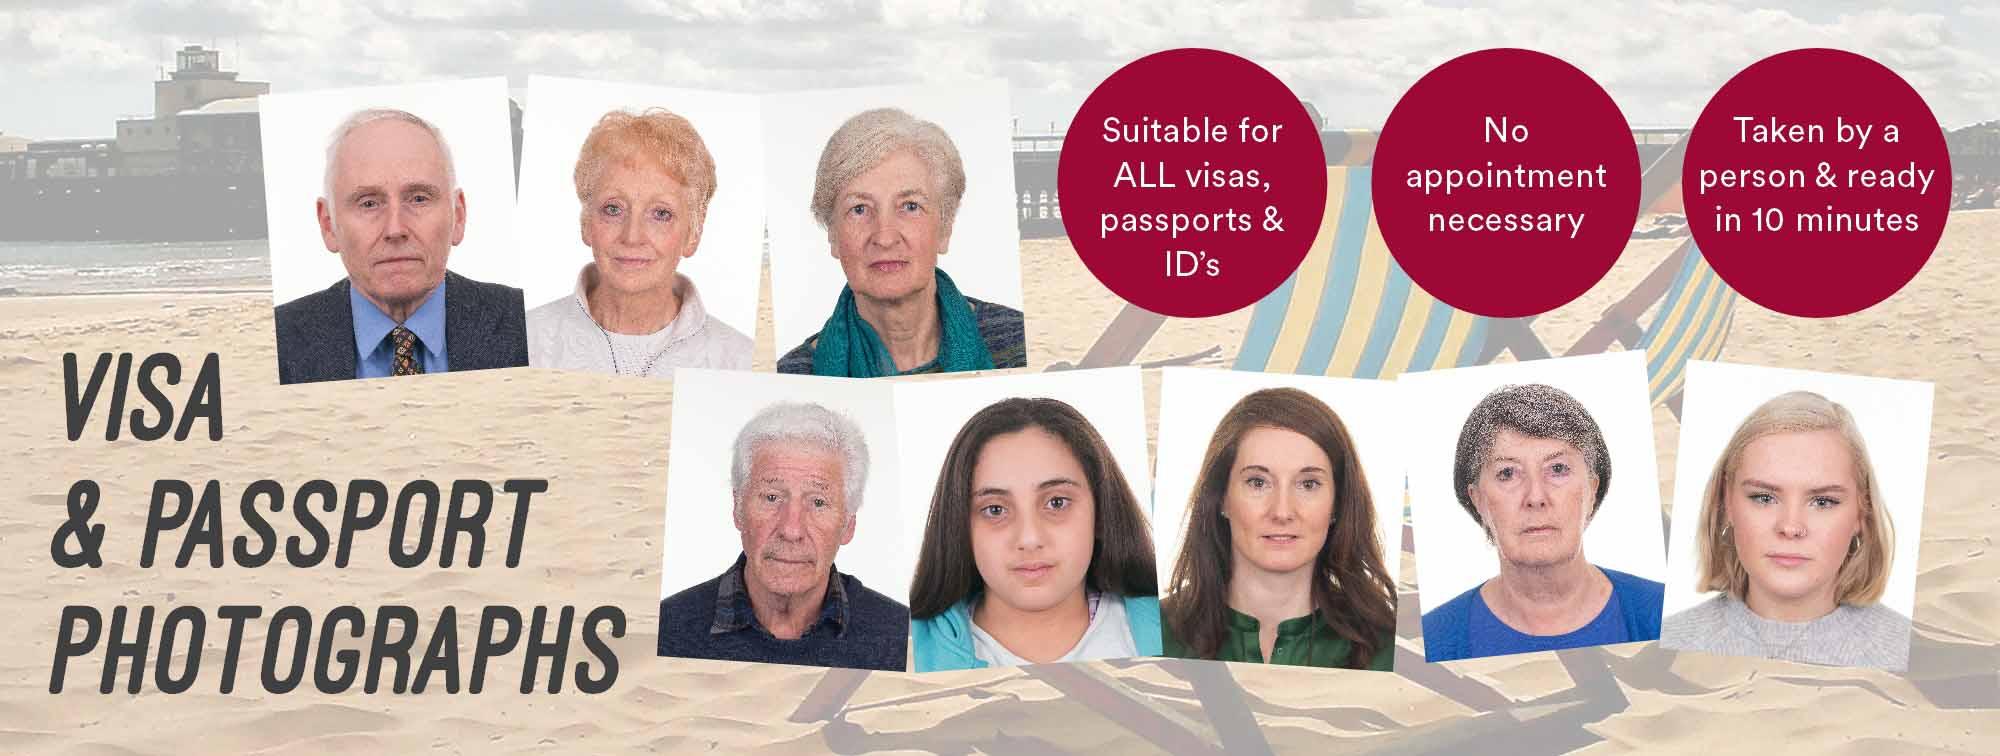 Professional Passport/Visa Photographs - Taken by a Real Photographer